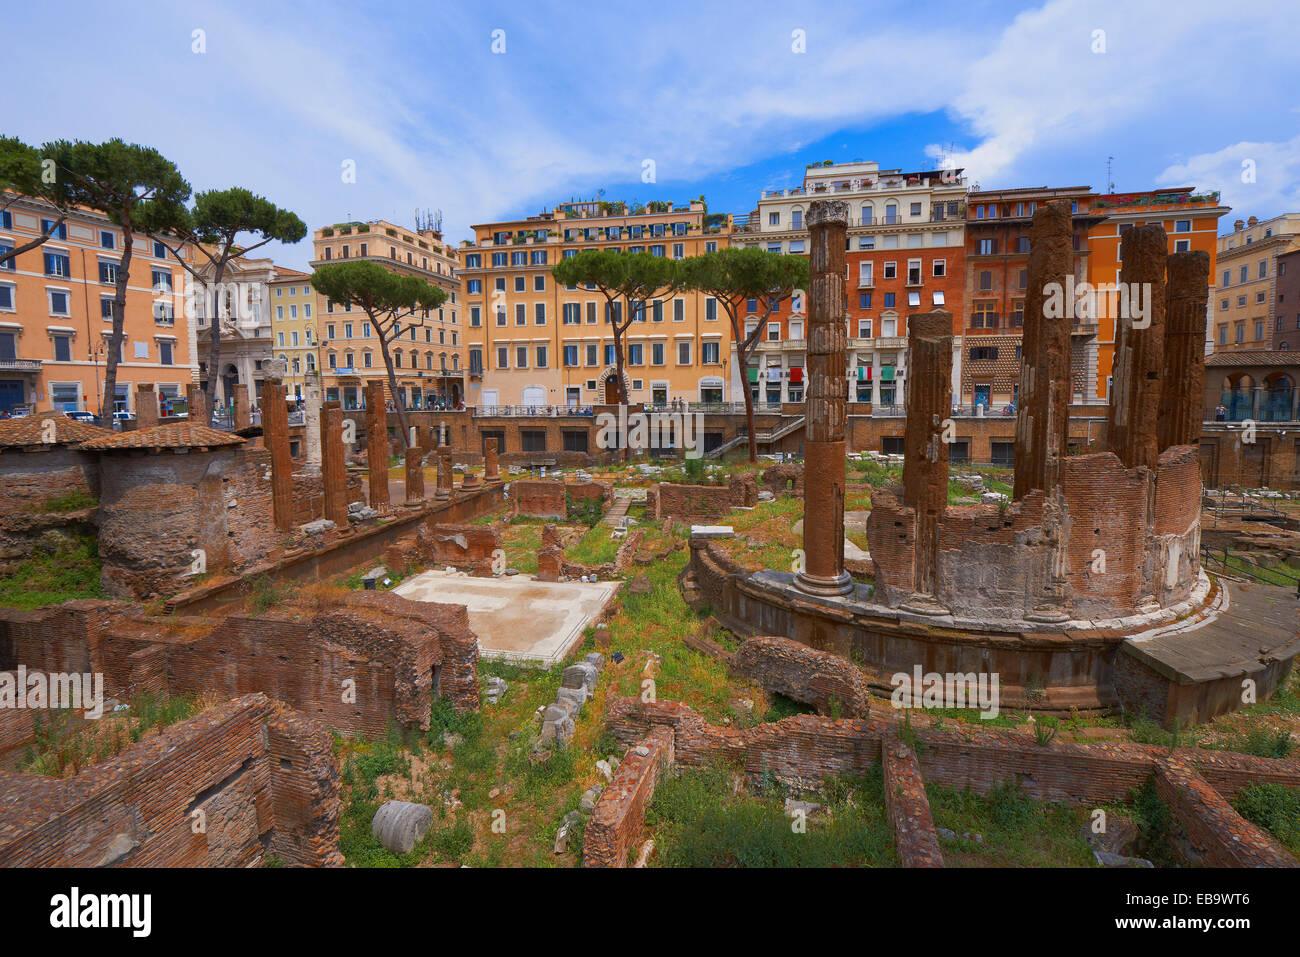 Area Sacra temple precincts, Largo di Torre Argentina square, Rome, Lazio, Italy - Stock Image